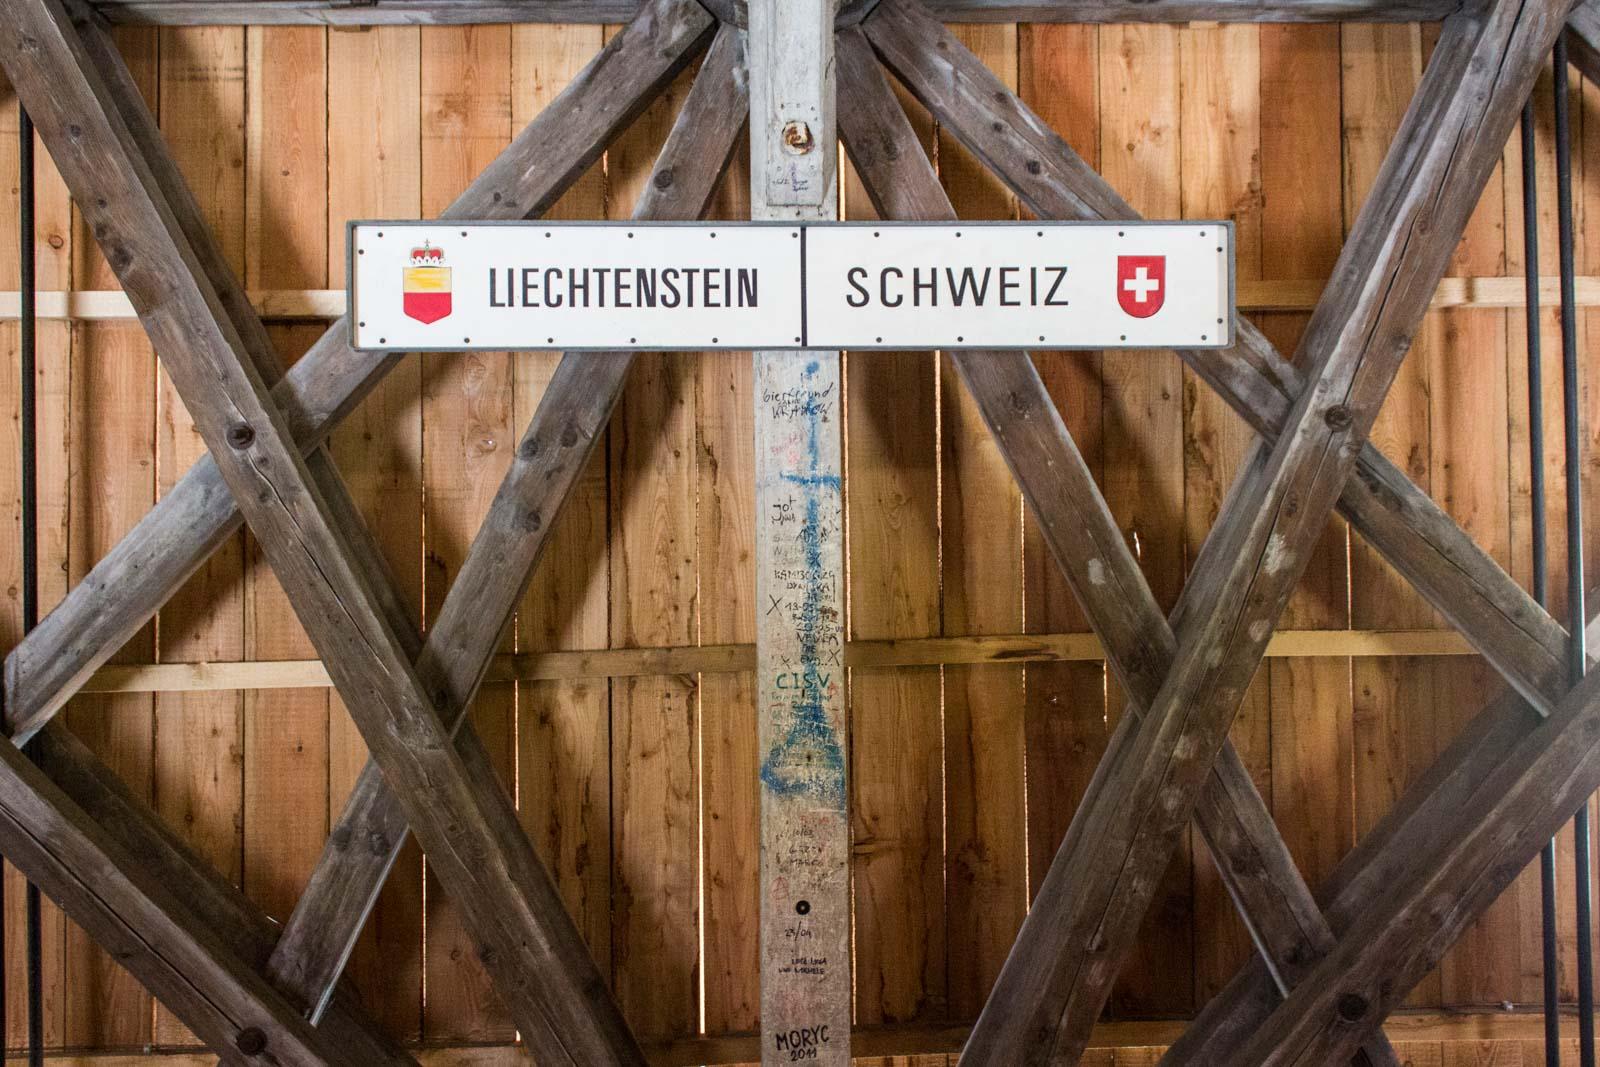 Walking across Liechtenstein